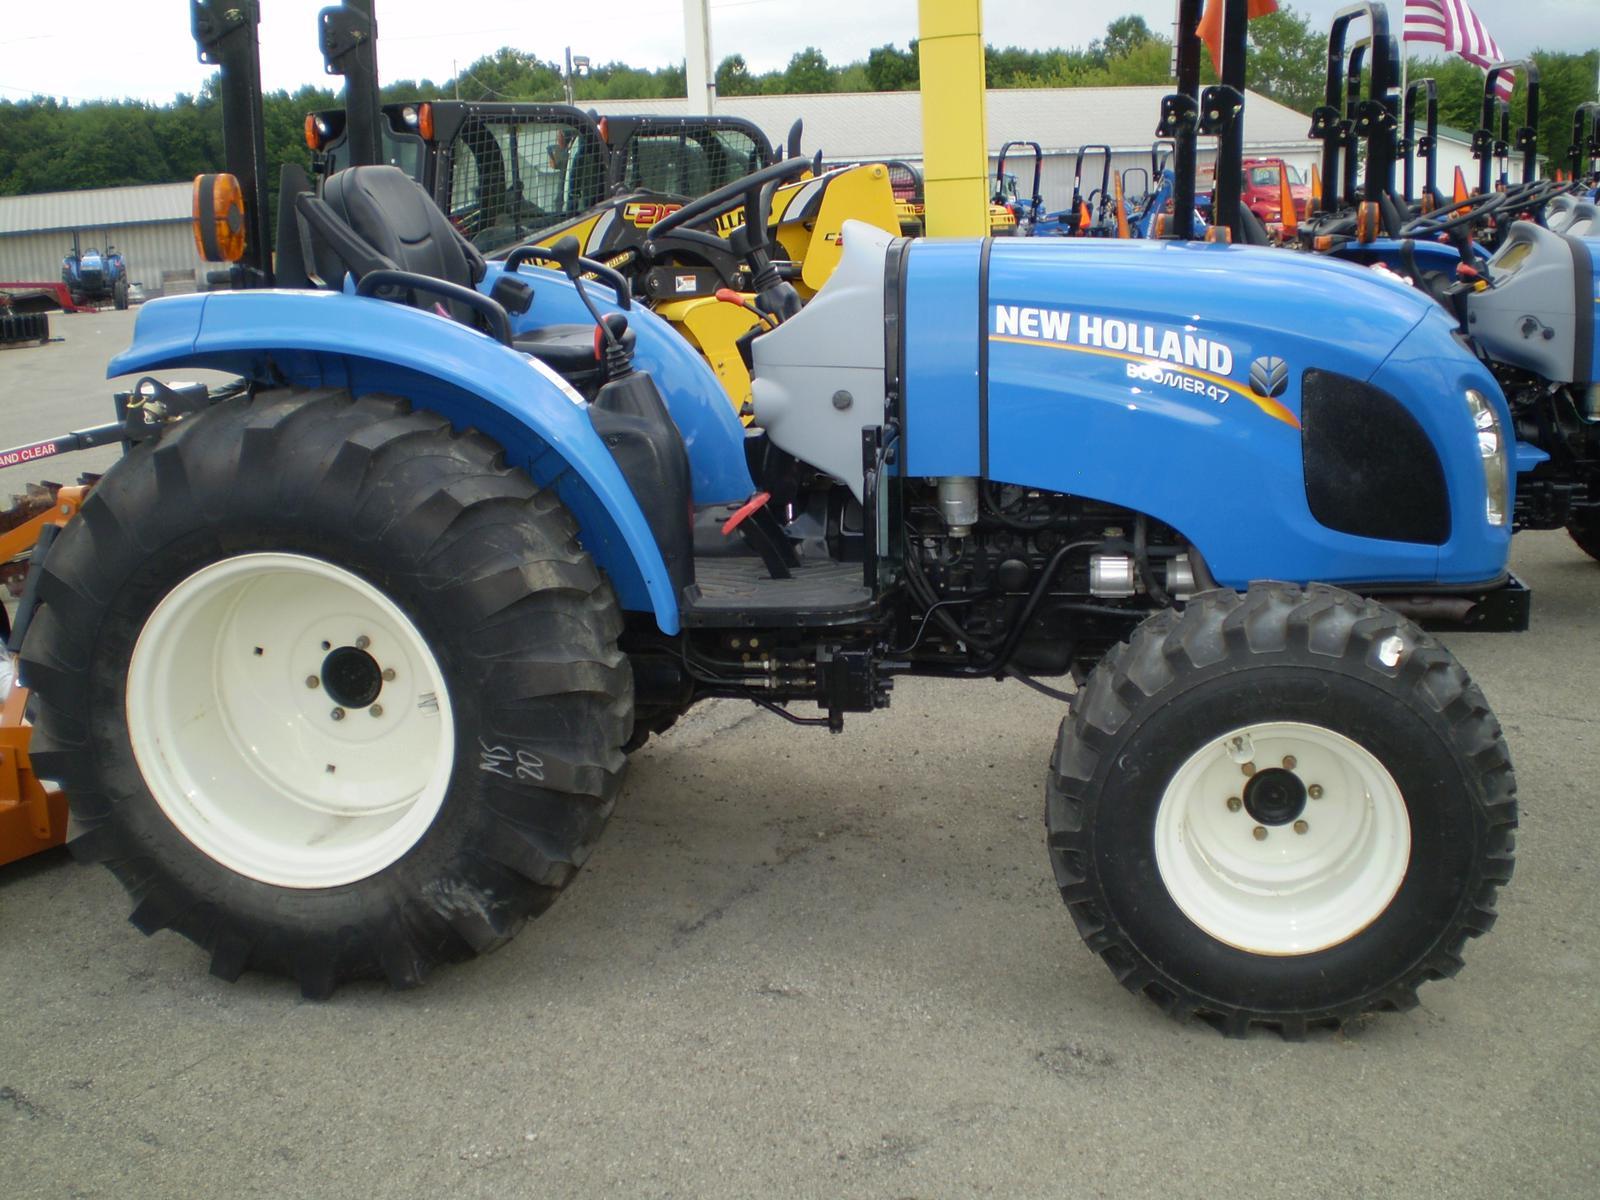 Inventory Bortnick Tractor Sales & Service